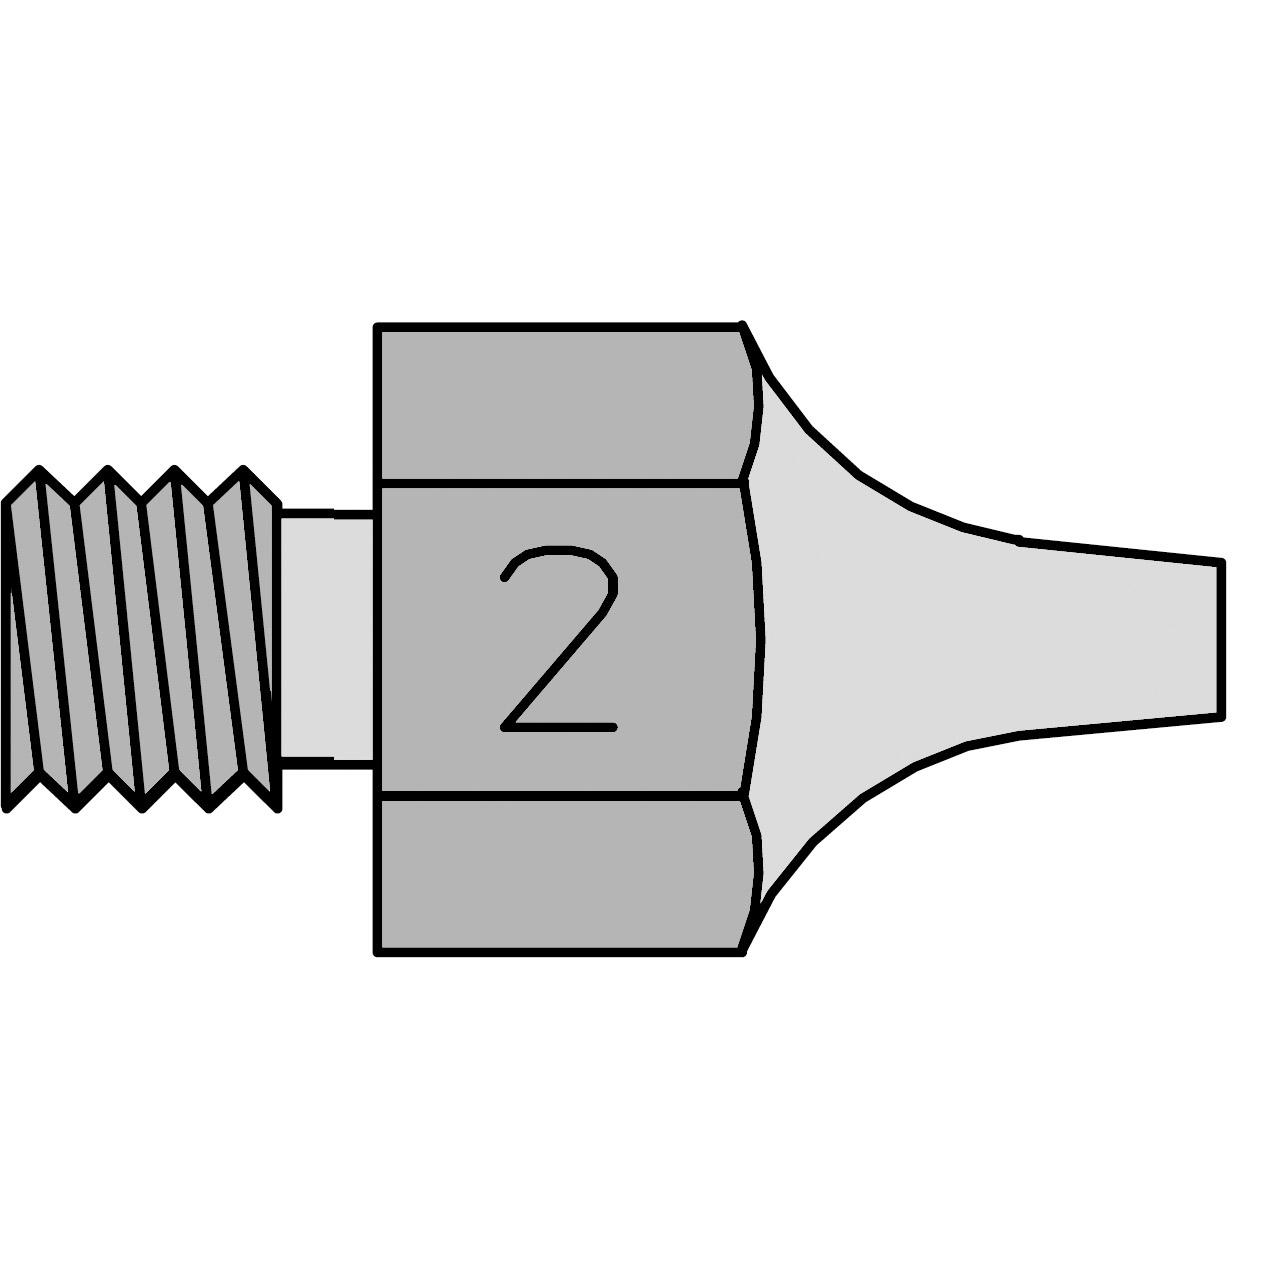 DS 112 Desoldering nozzle